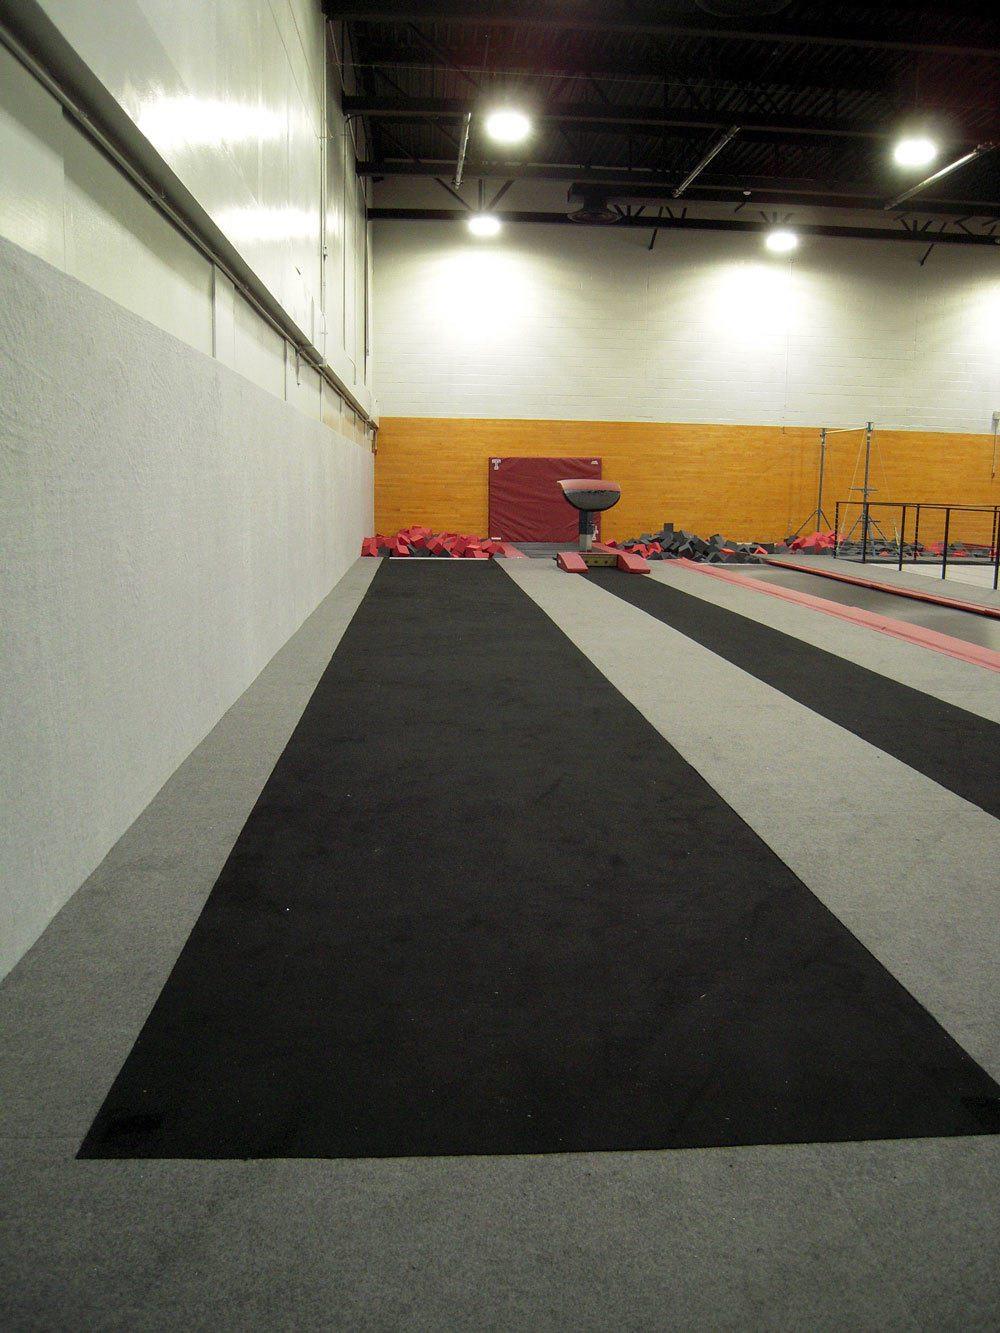 Temple University Gymnastics Gym Tumbling Strip